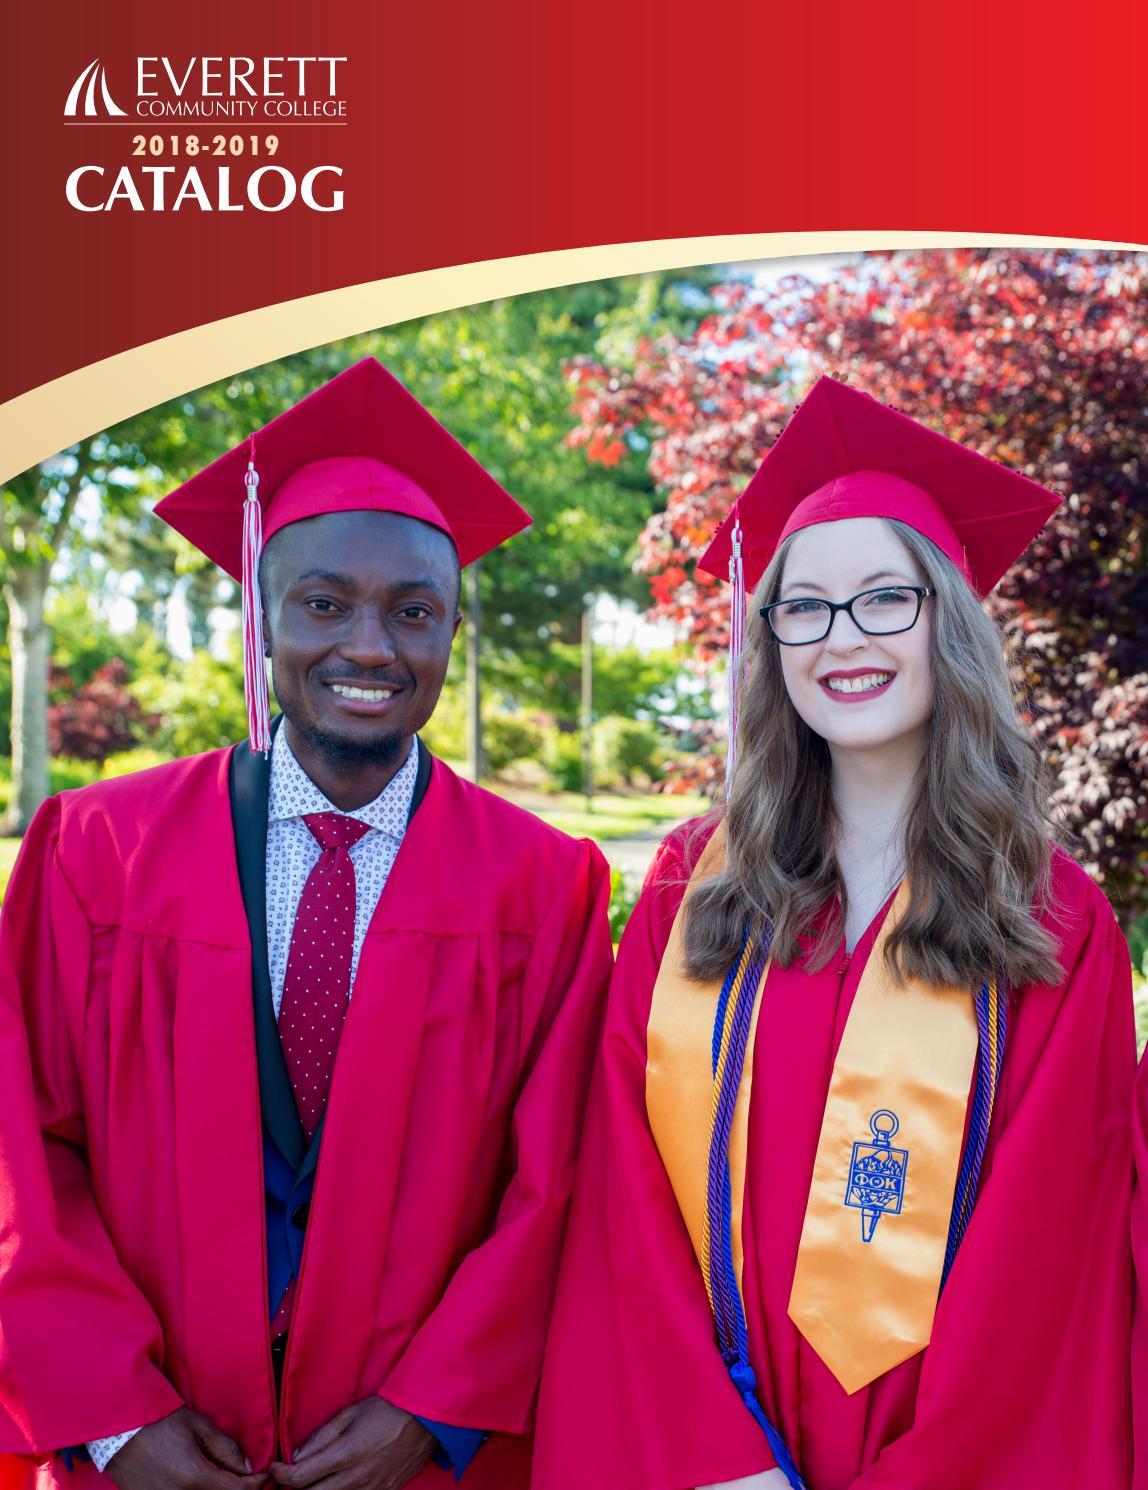 Everett Community College 2018 19 Catalog By Custom Flame Fuse Box Covers Issuu